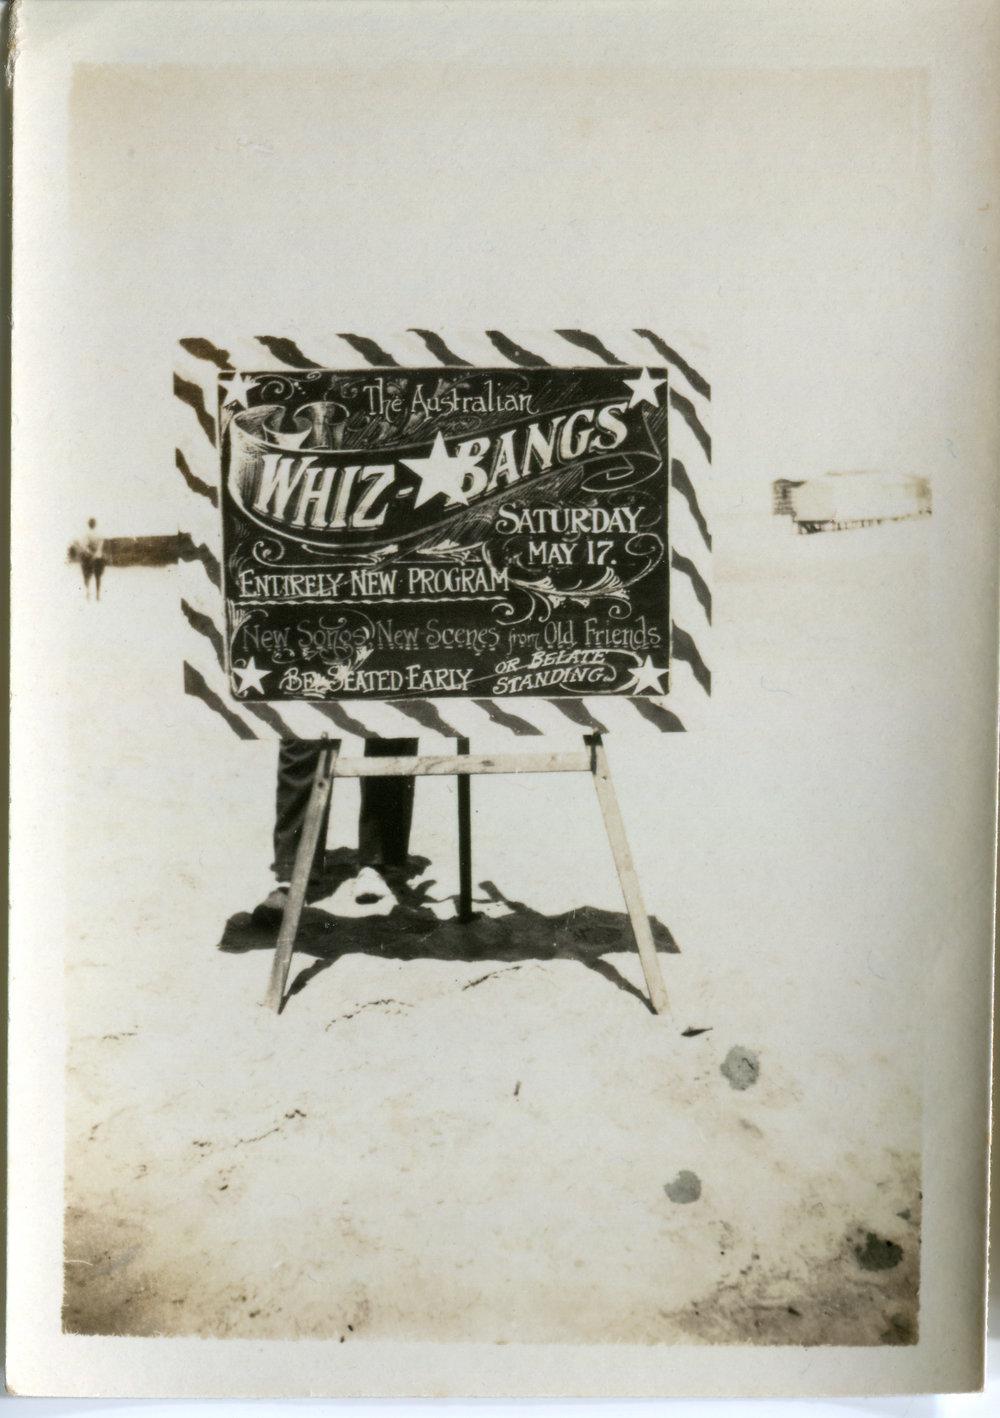 The Whiz Bangs performing at Zagazig, Lower Egypt, Saturday 17 May 1919.